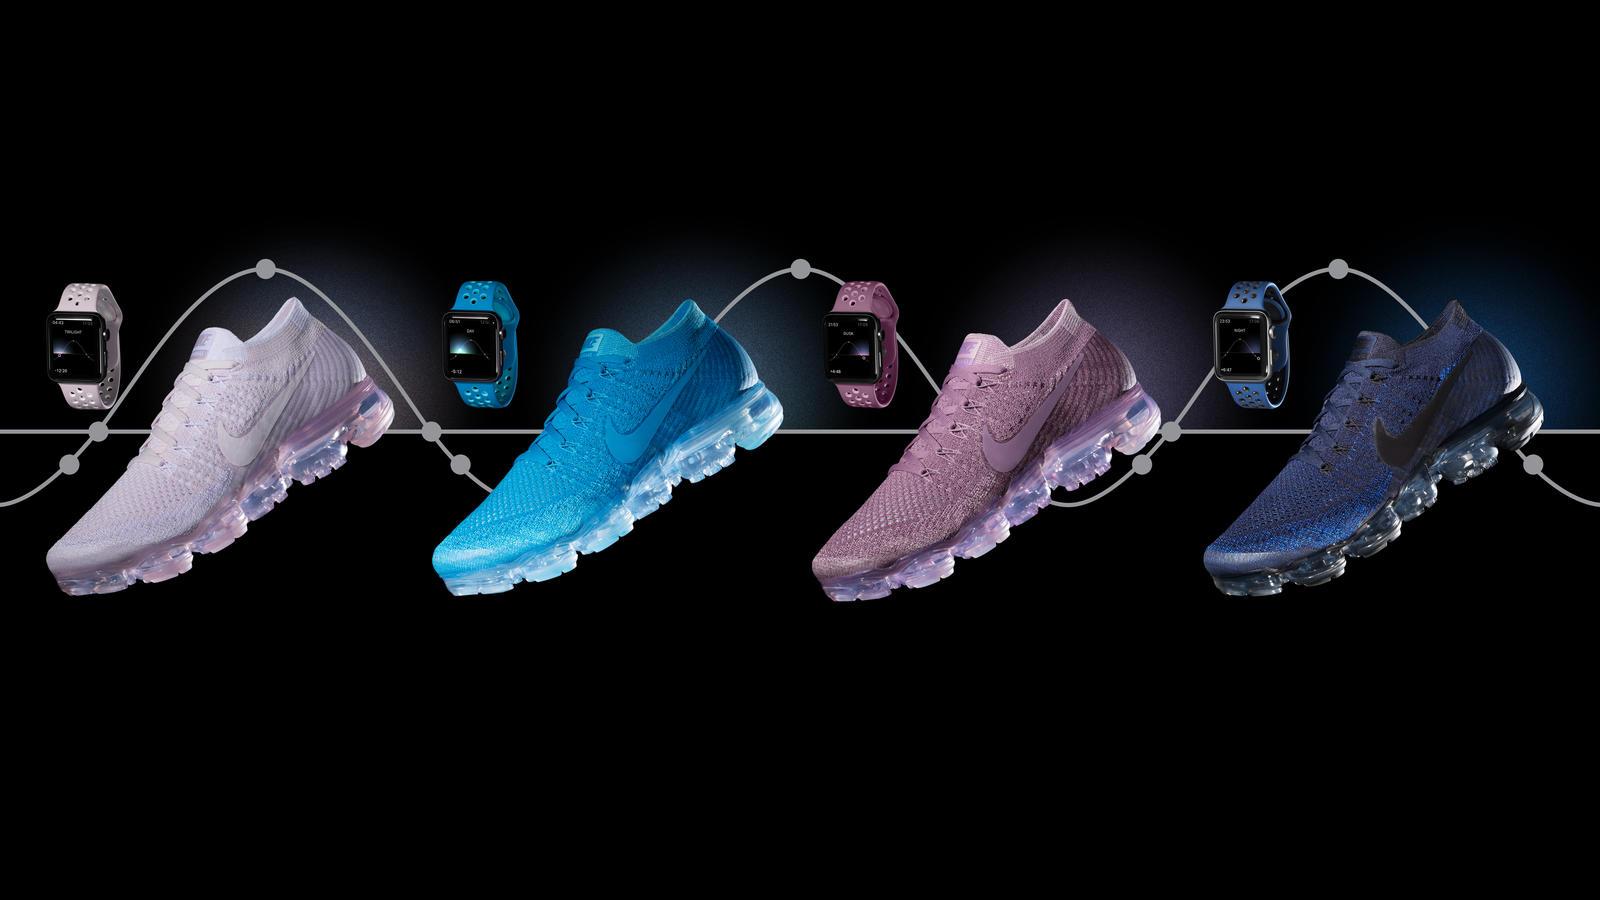 Nike Vapormax DTN Direction1 Full Set 16x9 hd 1600